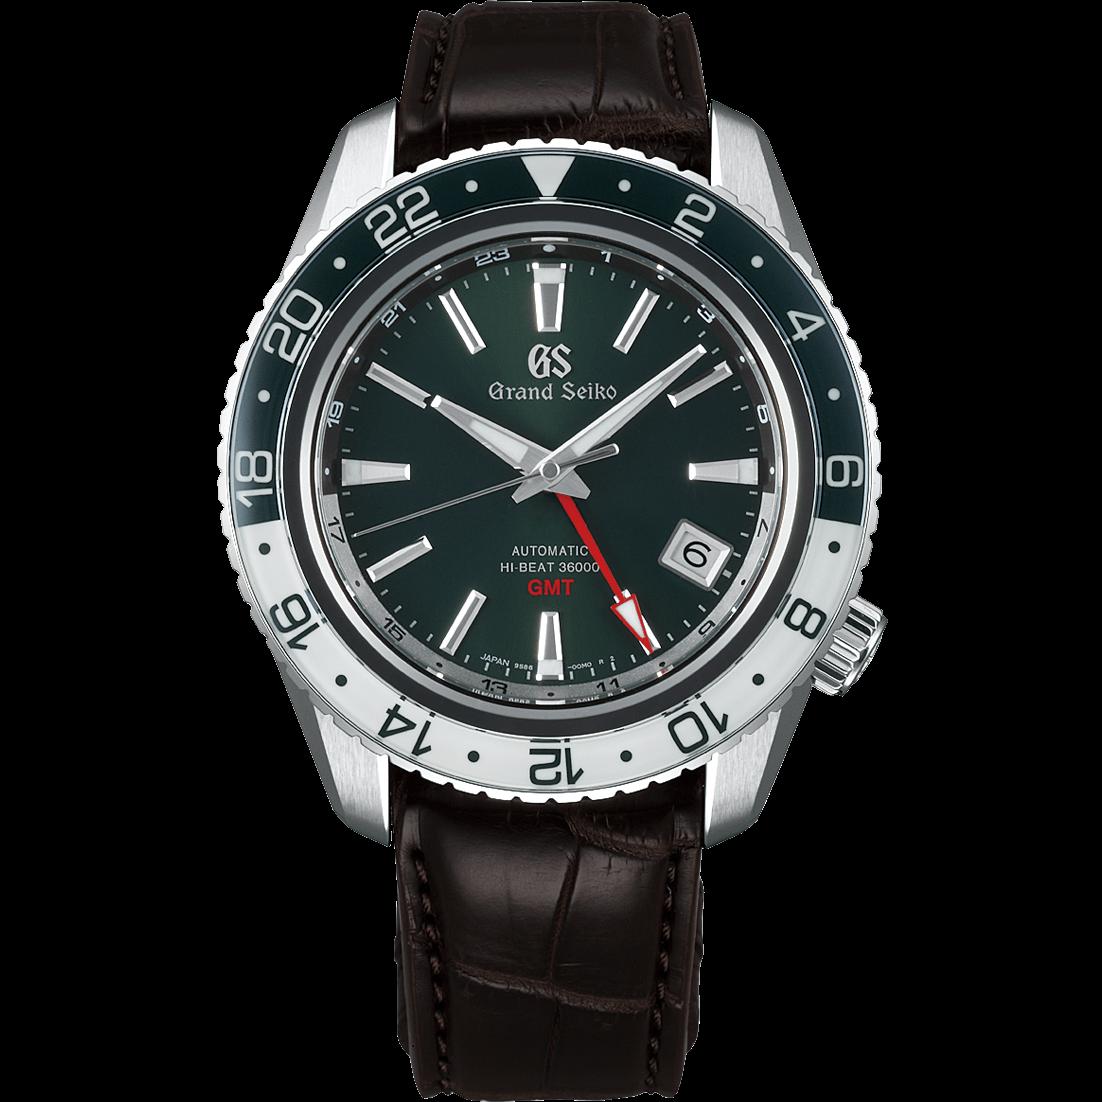 Grand Seiko SBGJ239 Hi-Beat green-dial men's wristwatch